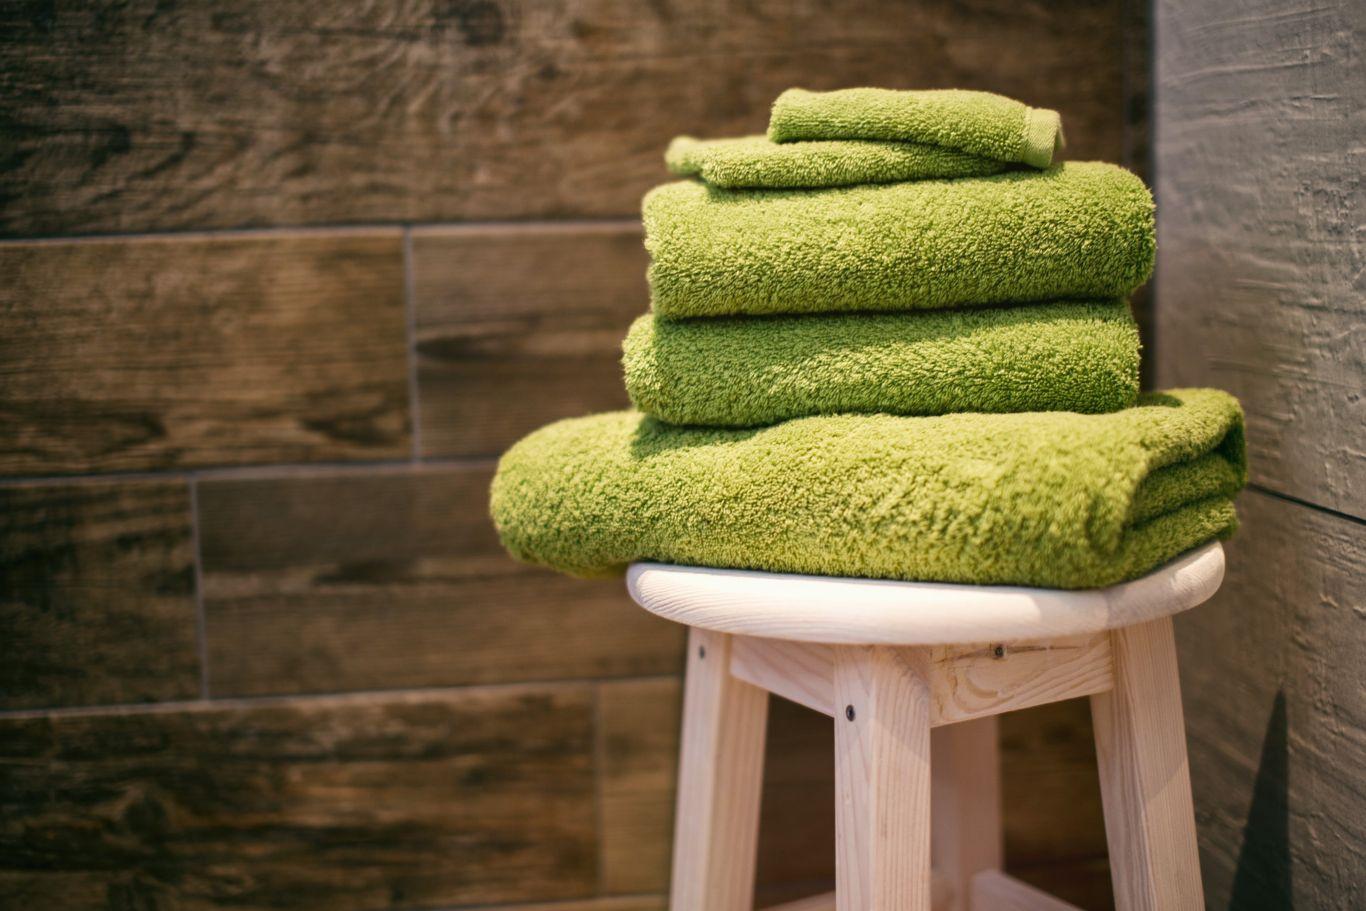 sauna segredo da longevidade 3